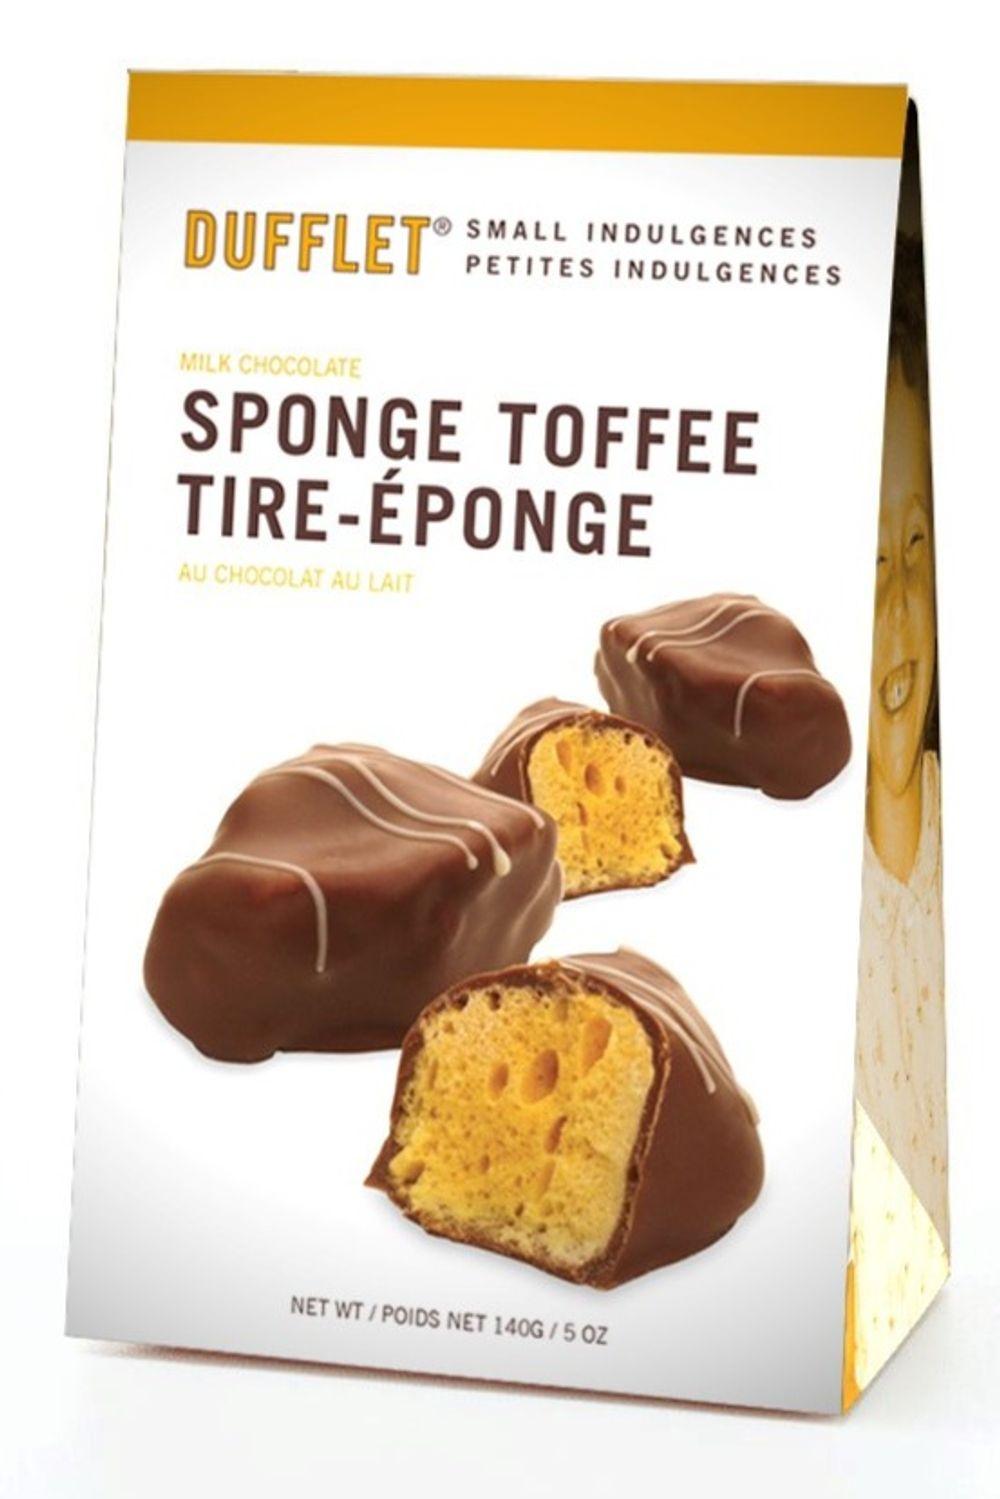 Milk Chocolate Sponge Toffee